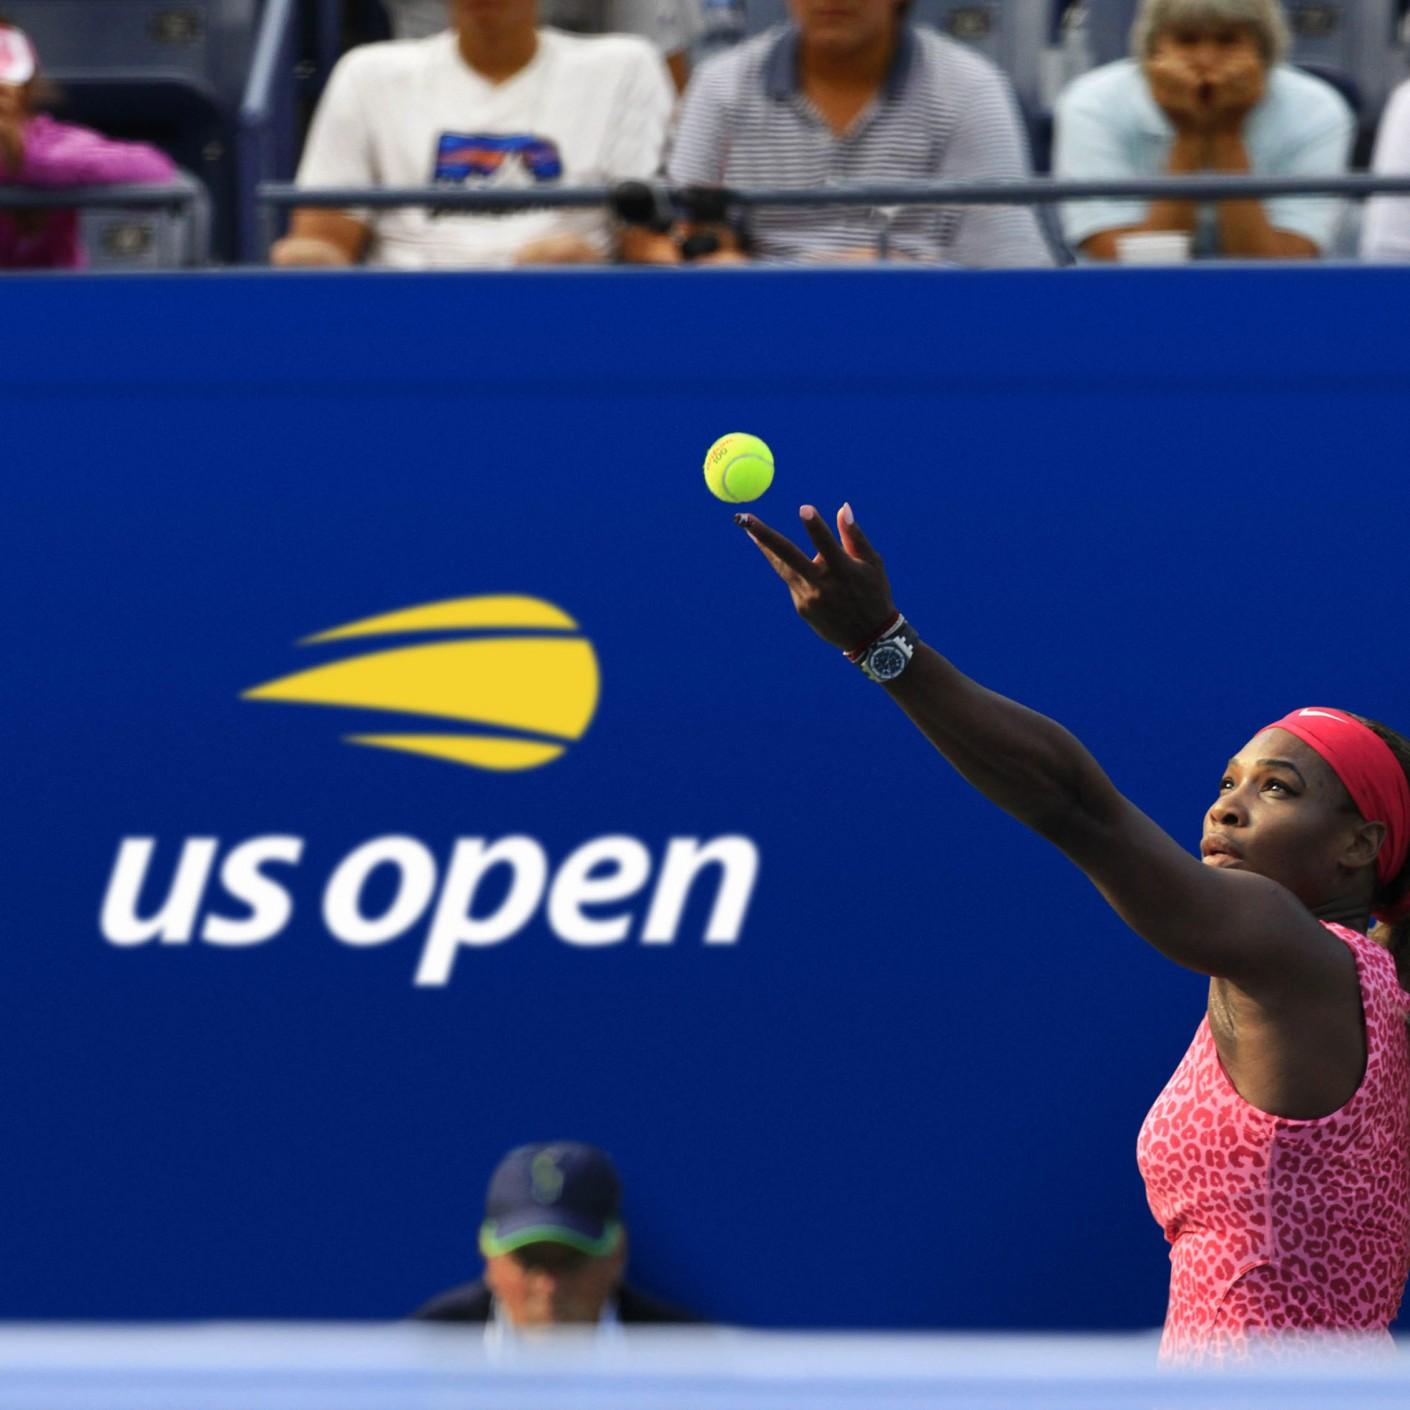 U S Open Tennis Championships Chermayeff Geismar Haviv